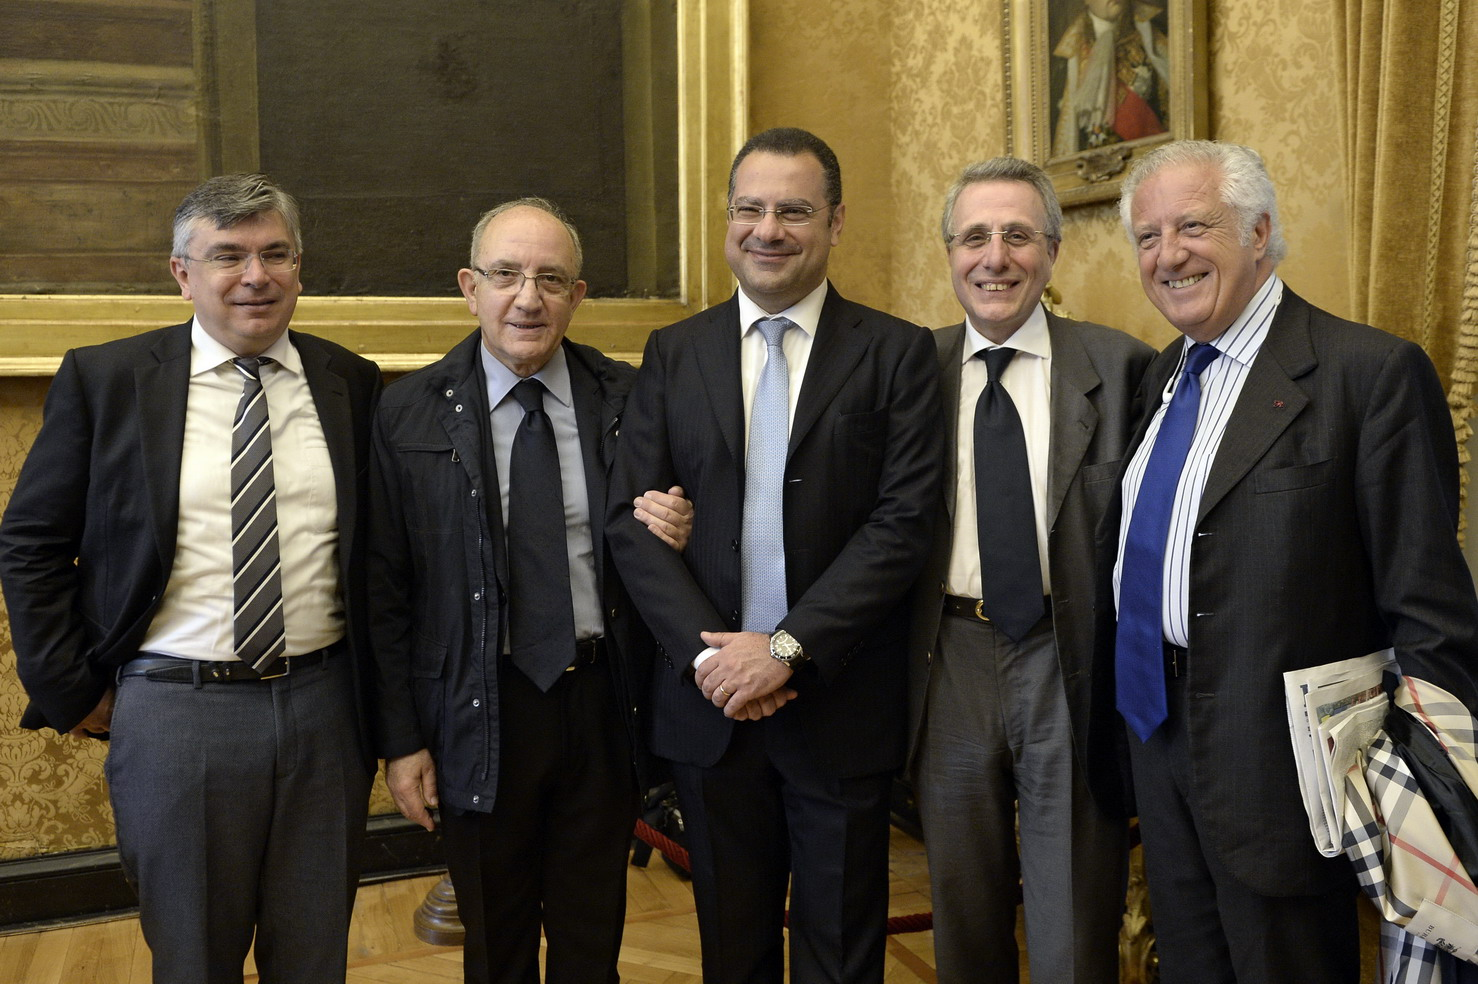 Paolo Gheda, Mario Tassone, Paolo Messa, Mario Caligiuri, Paolo Naccarato